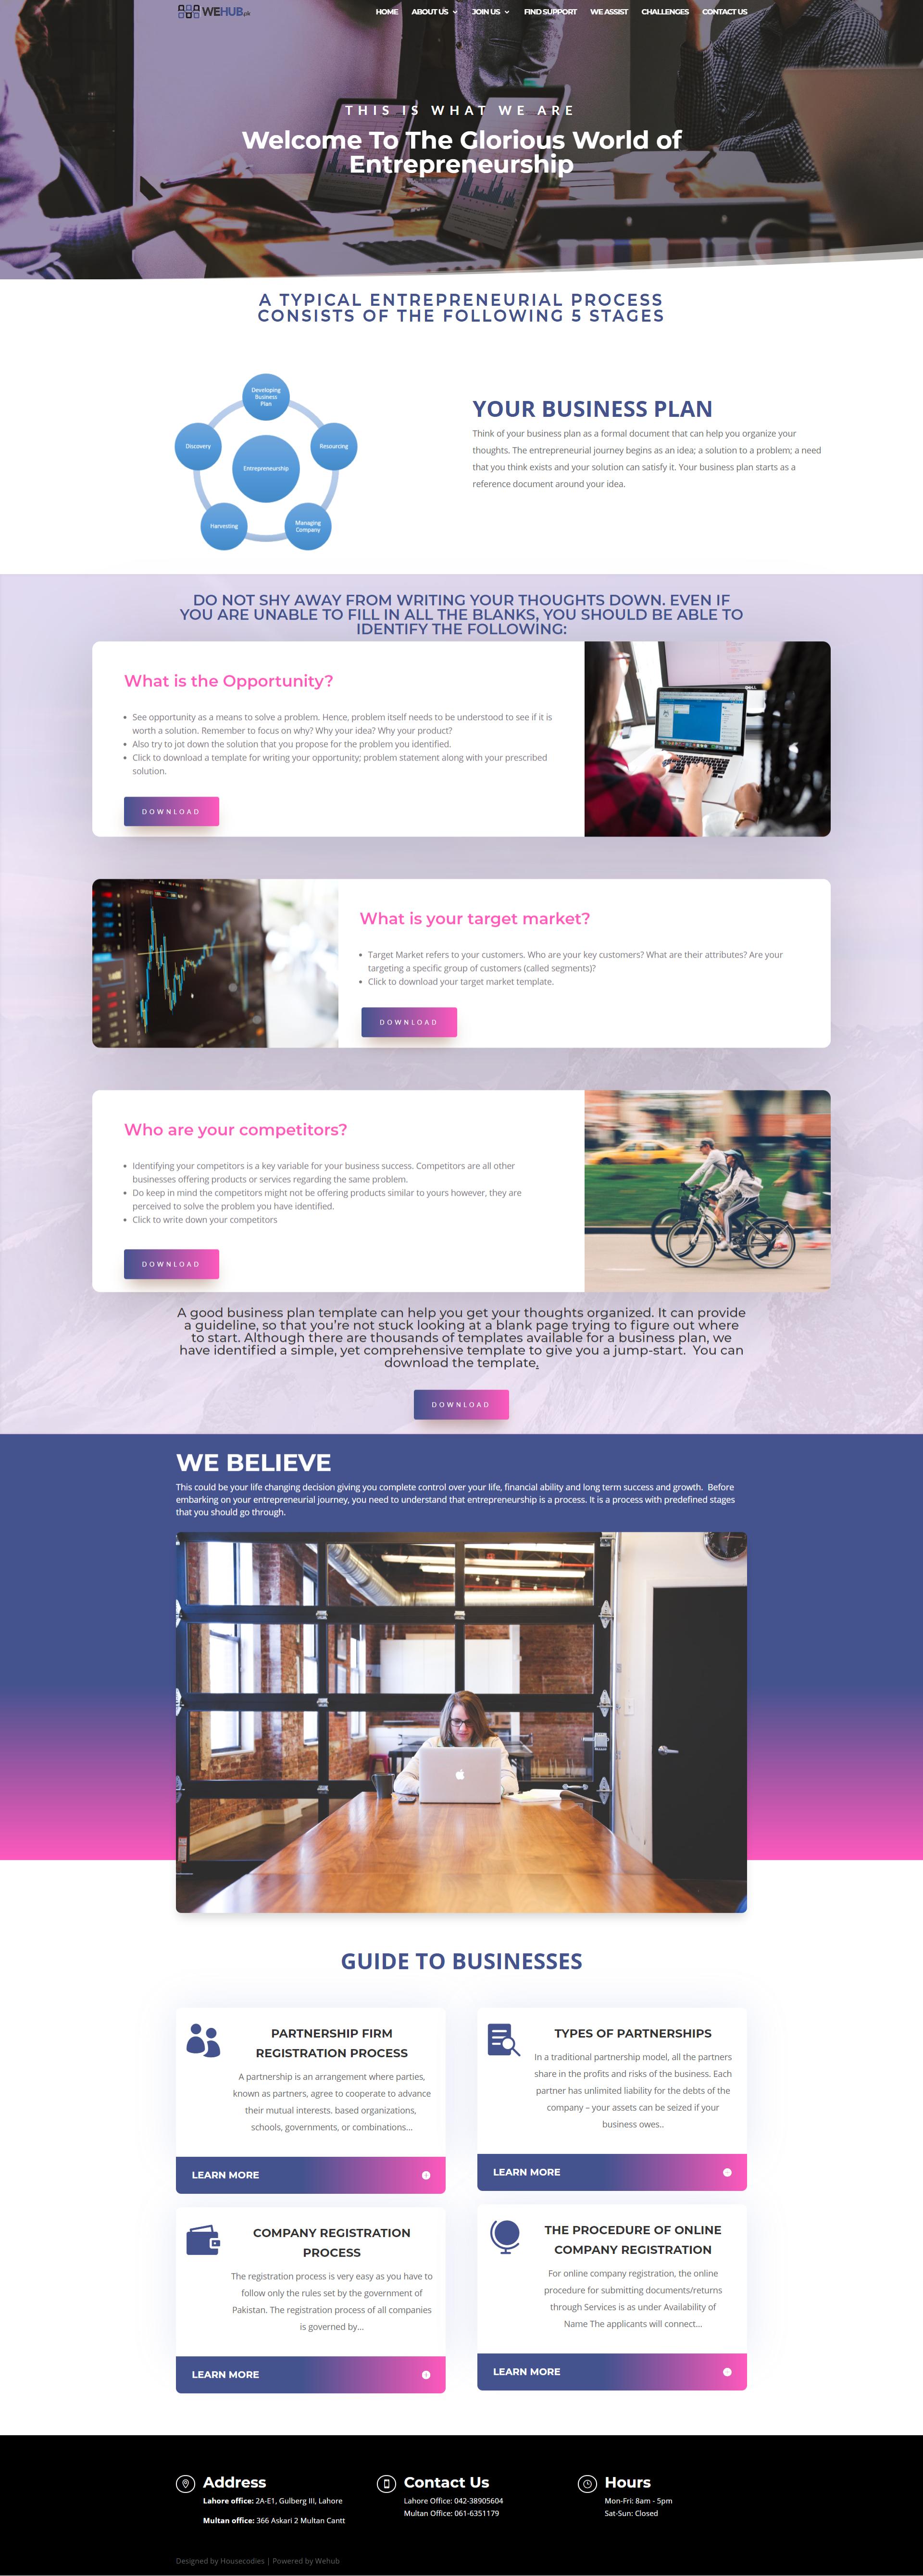 Wehub - UI UX Design - Visual Branding Project